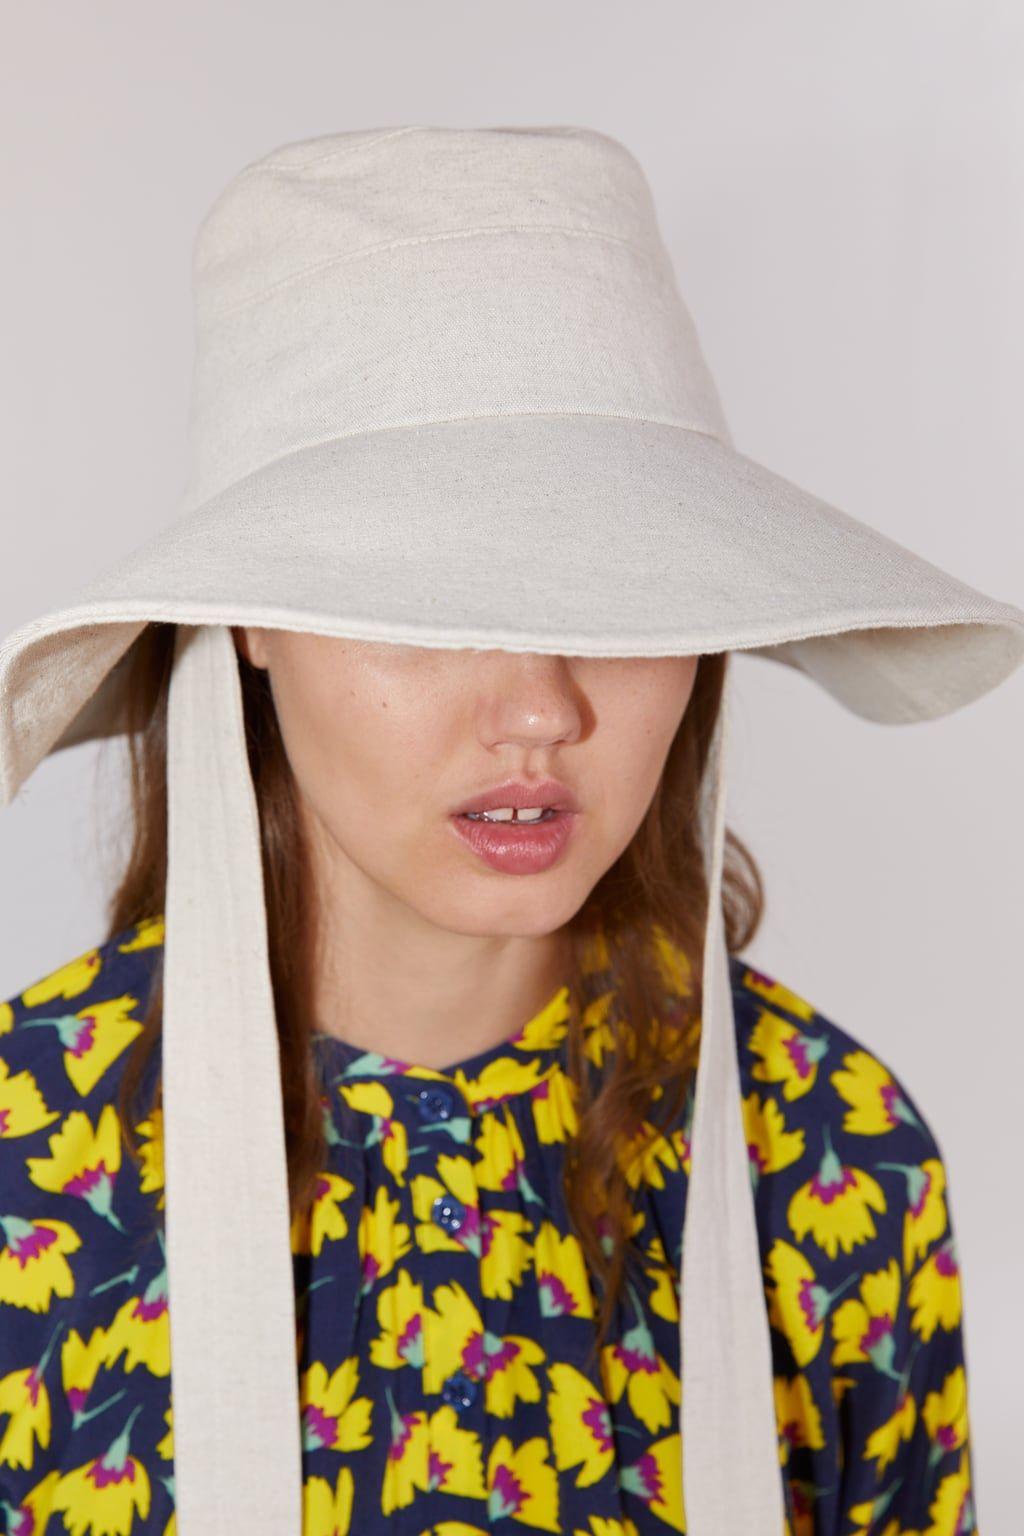 Zara Burgundy Maroon Leather Bucket Hat In 2021 Maroon Leather Leather Bucket Hat Zara